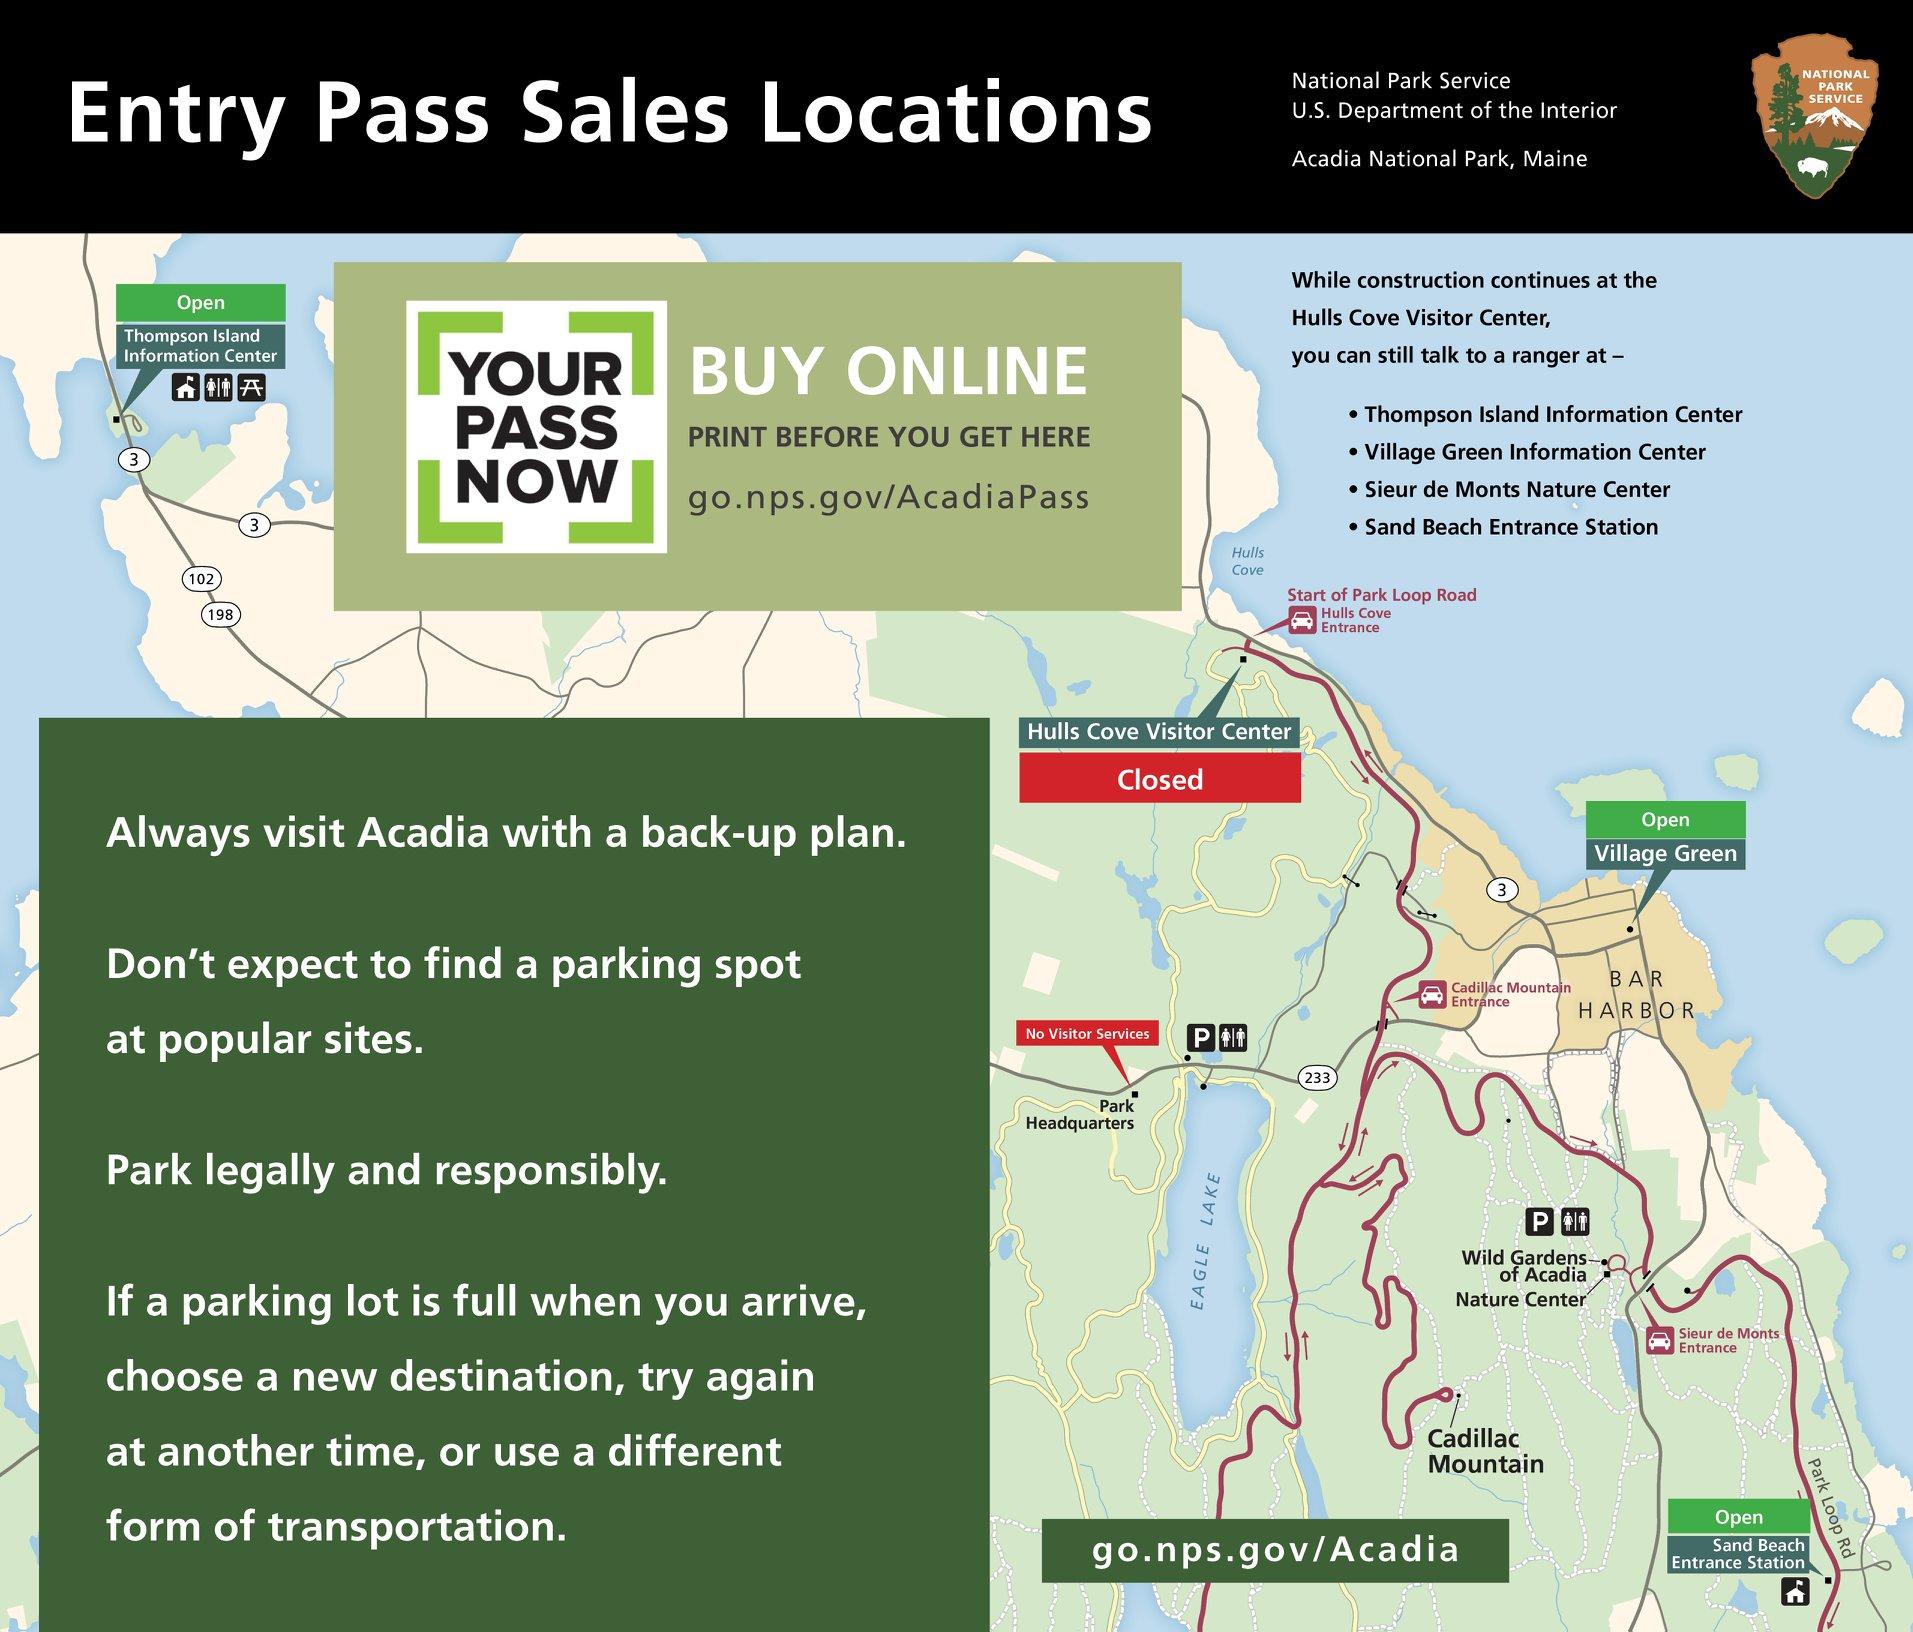 Acadia National Park visitors face roadblocks to buying pass